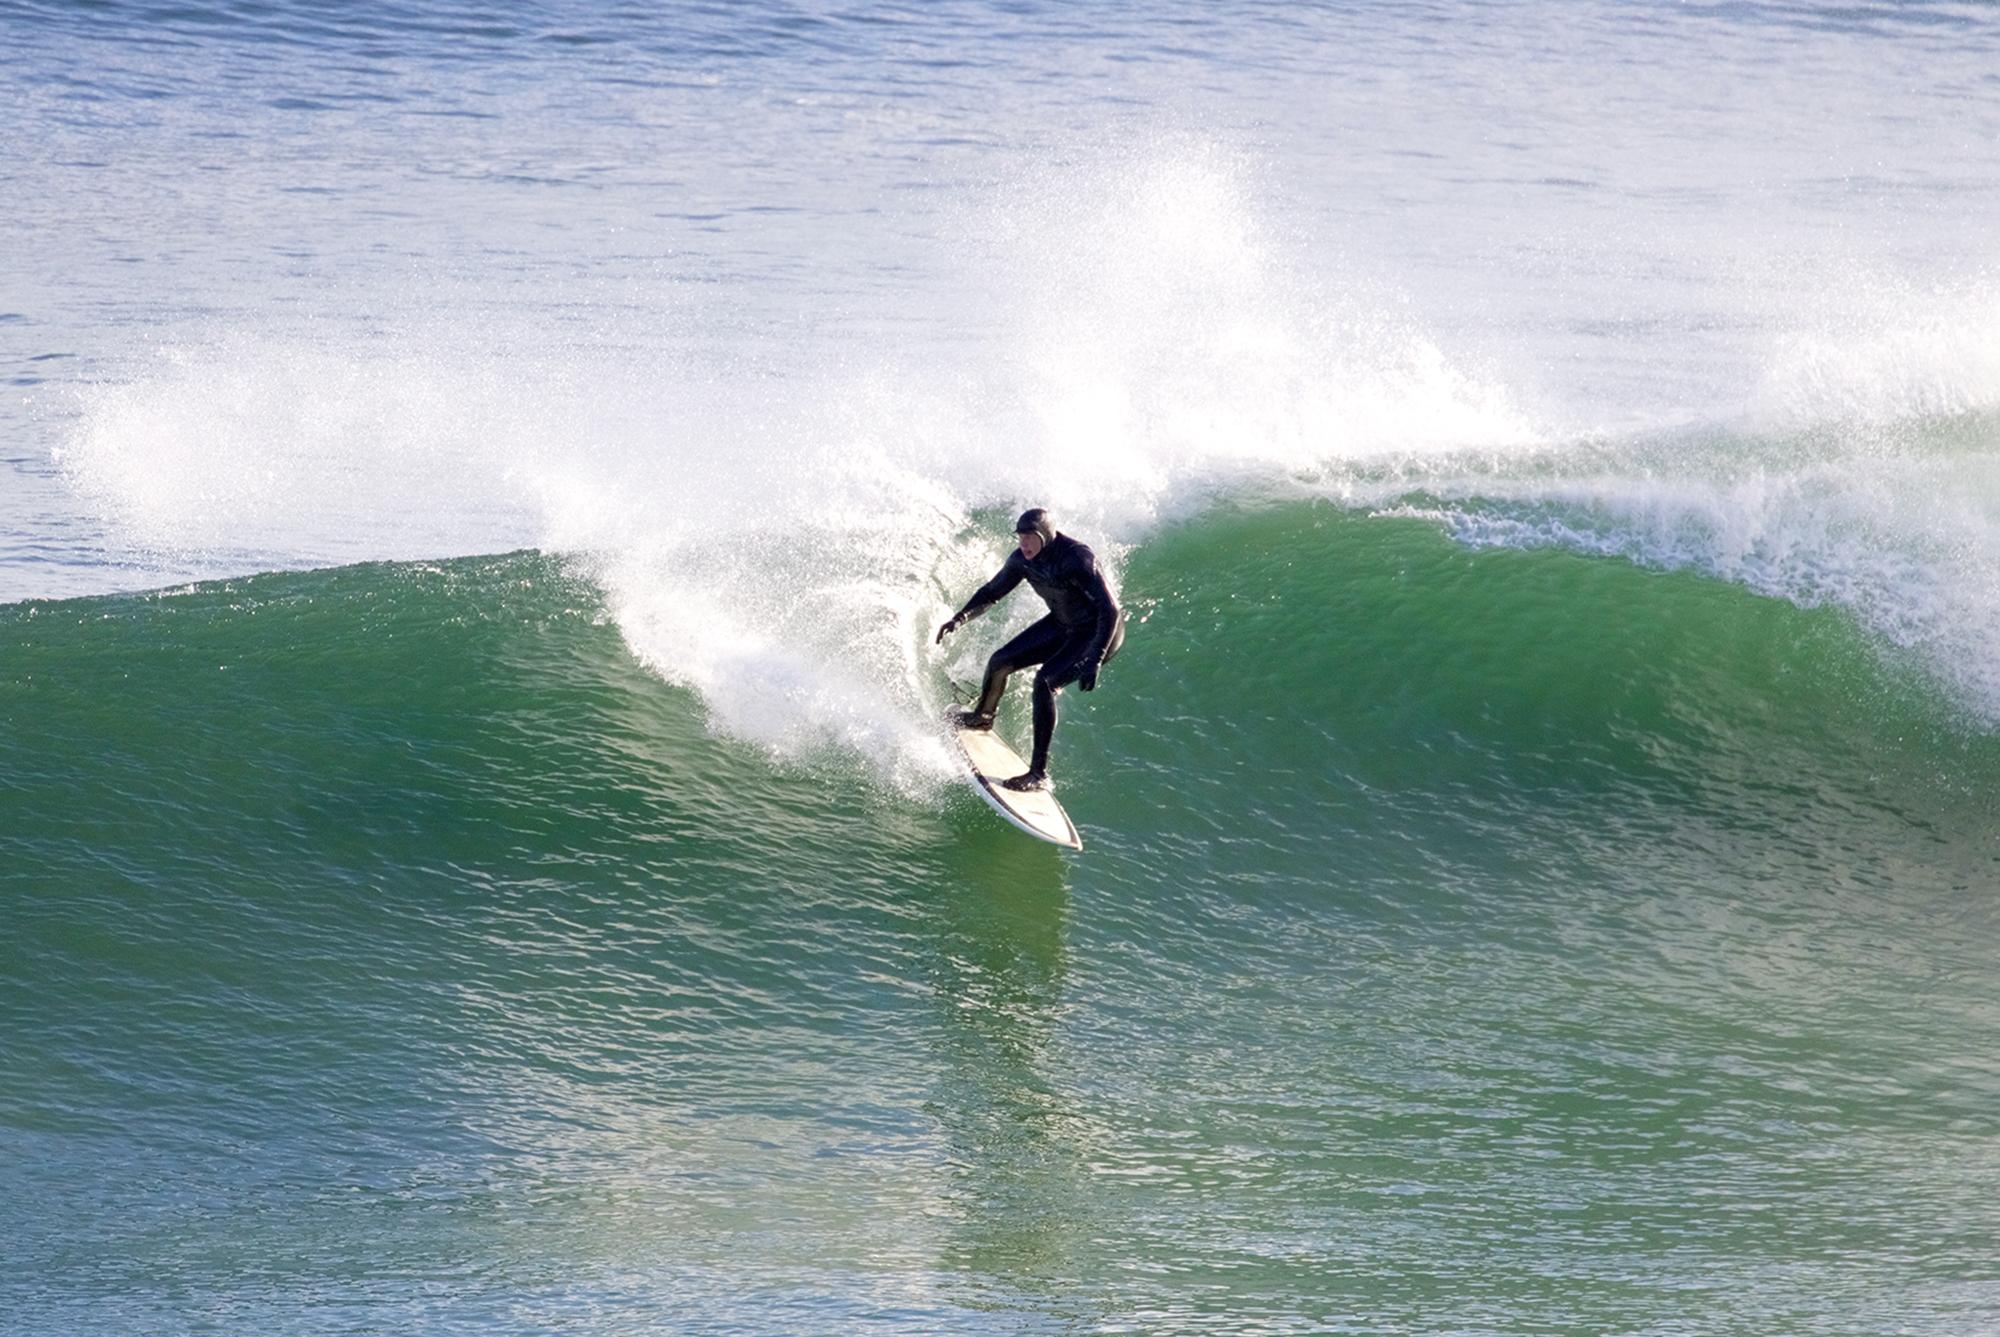 1-19-17 MTK Surfer 21.jpg